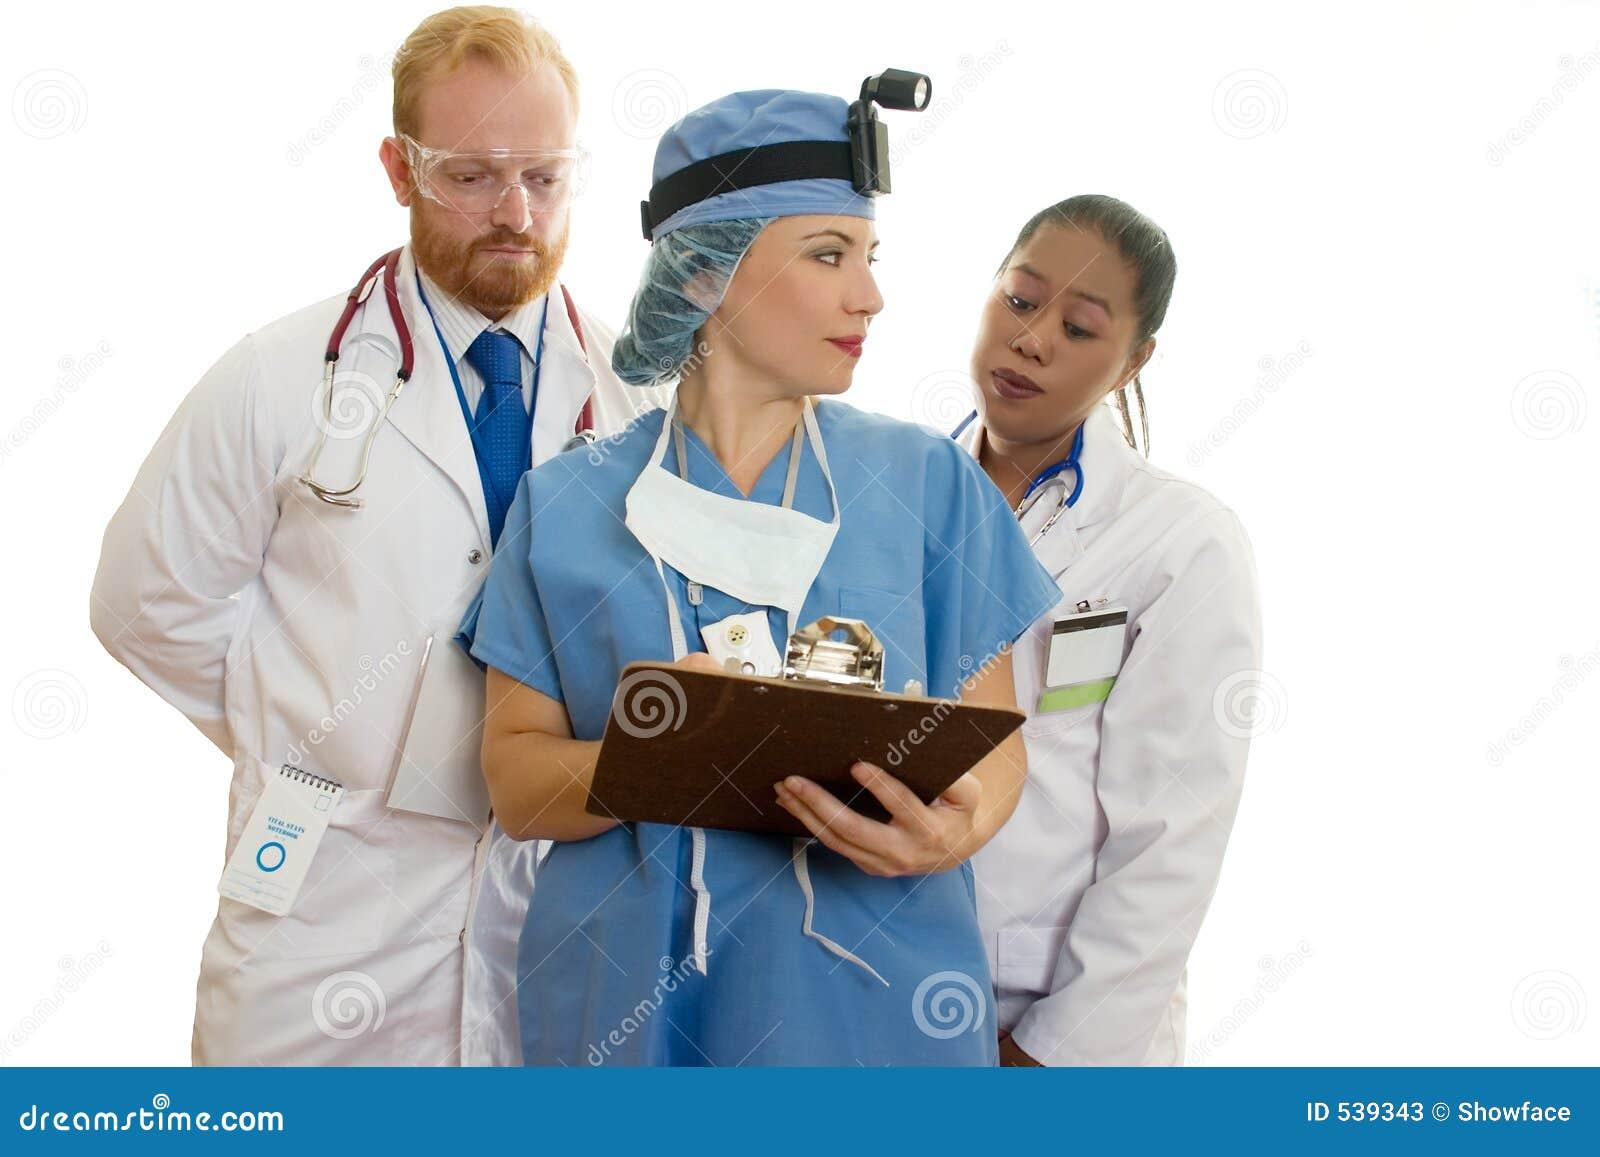 Download 医疗保健医疗人员三 库存图片. 图片 包括有 成人, 实习生, 外科医生, 诊所, 患者, 专家, 临床, 分集 - 539343